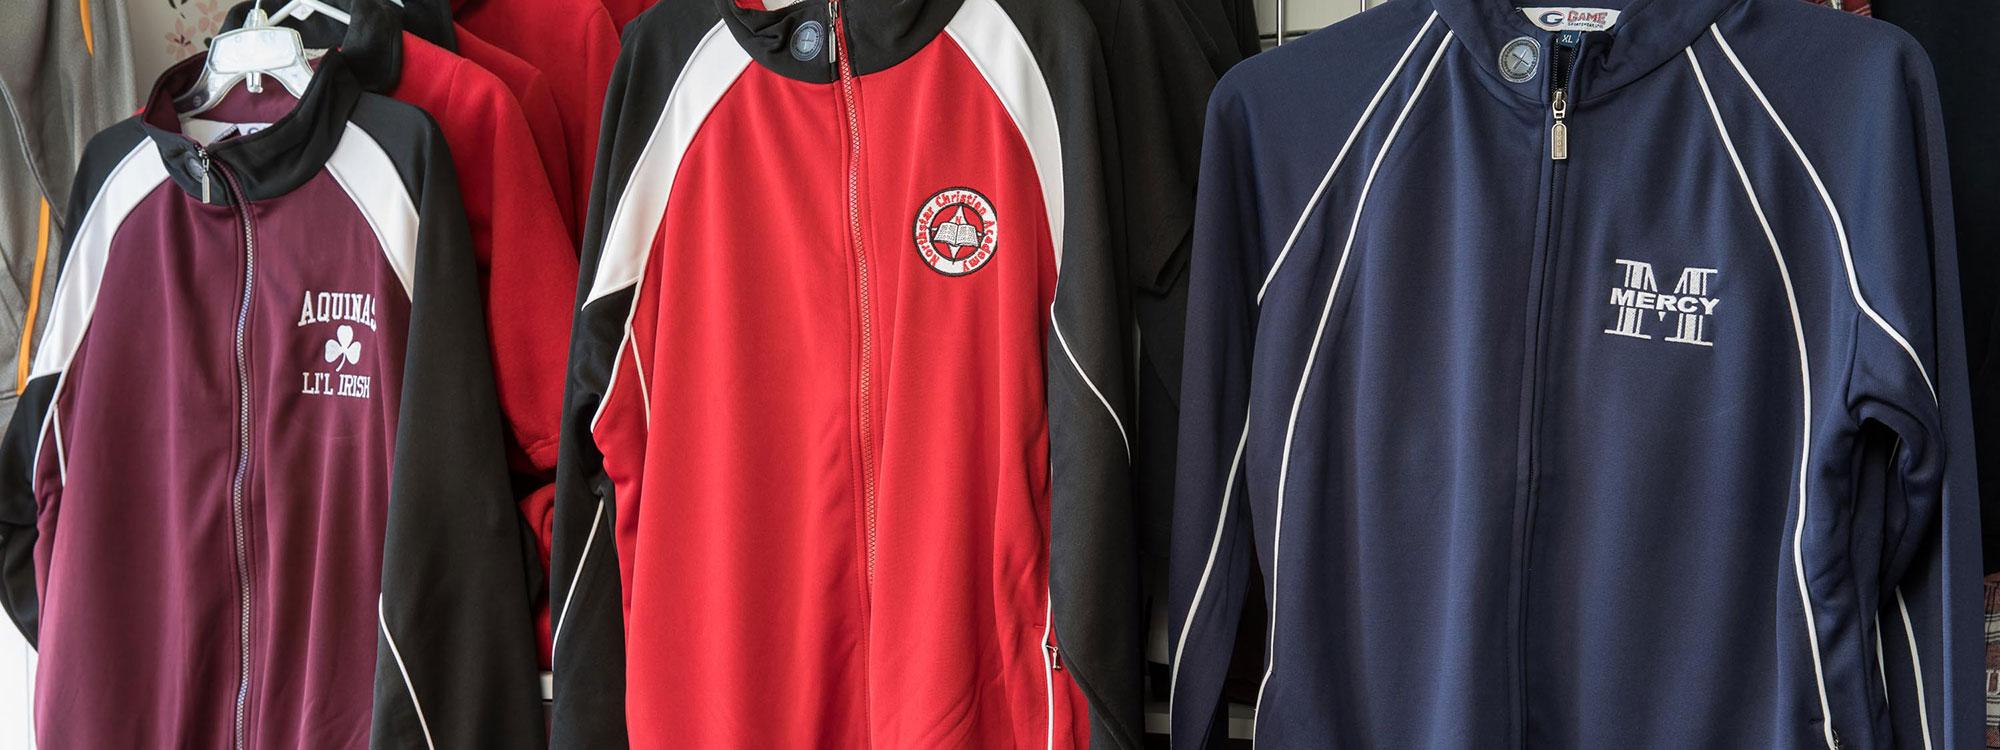 8c22814fa28 Stitchworks - school uniforms - embroidery - Rochester